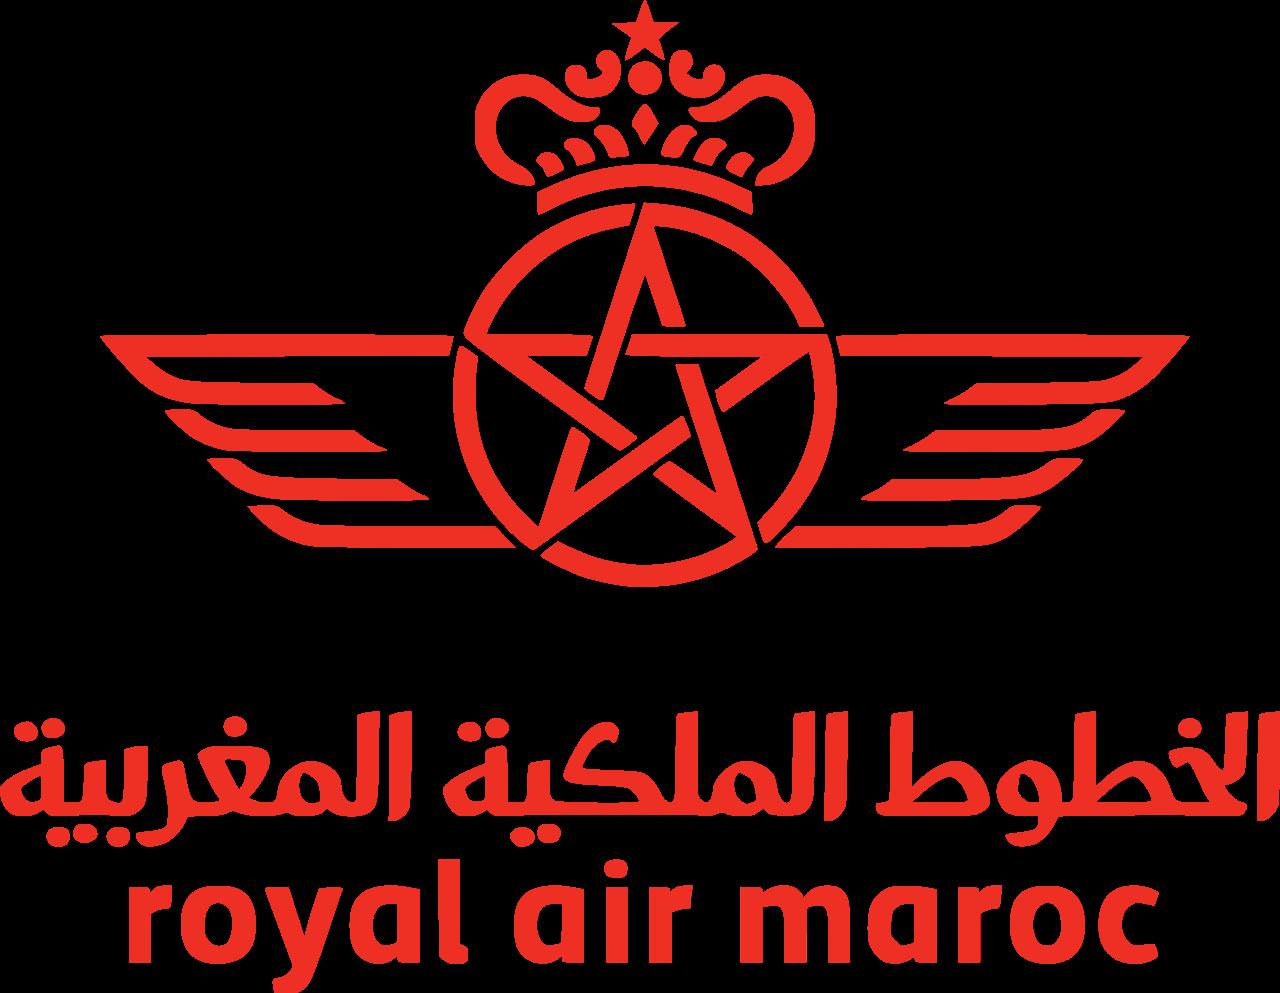 tiket pesawat ROYAL AIR MAROC